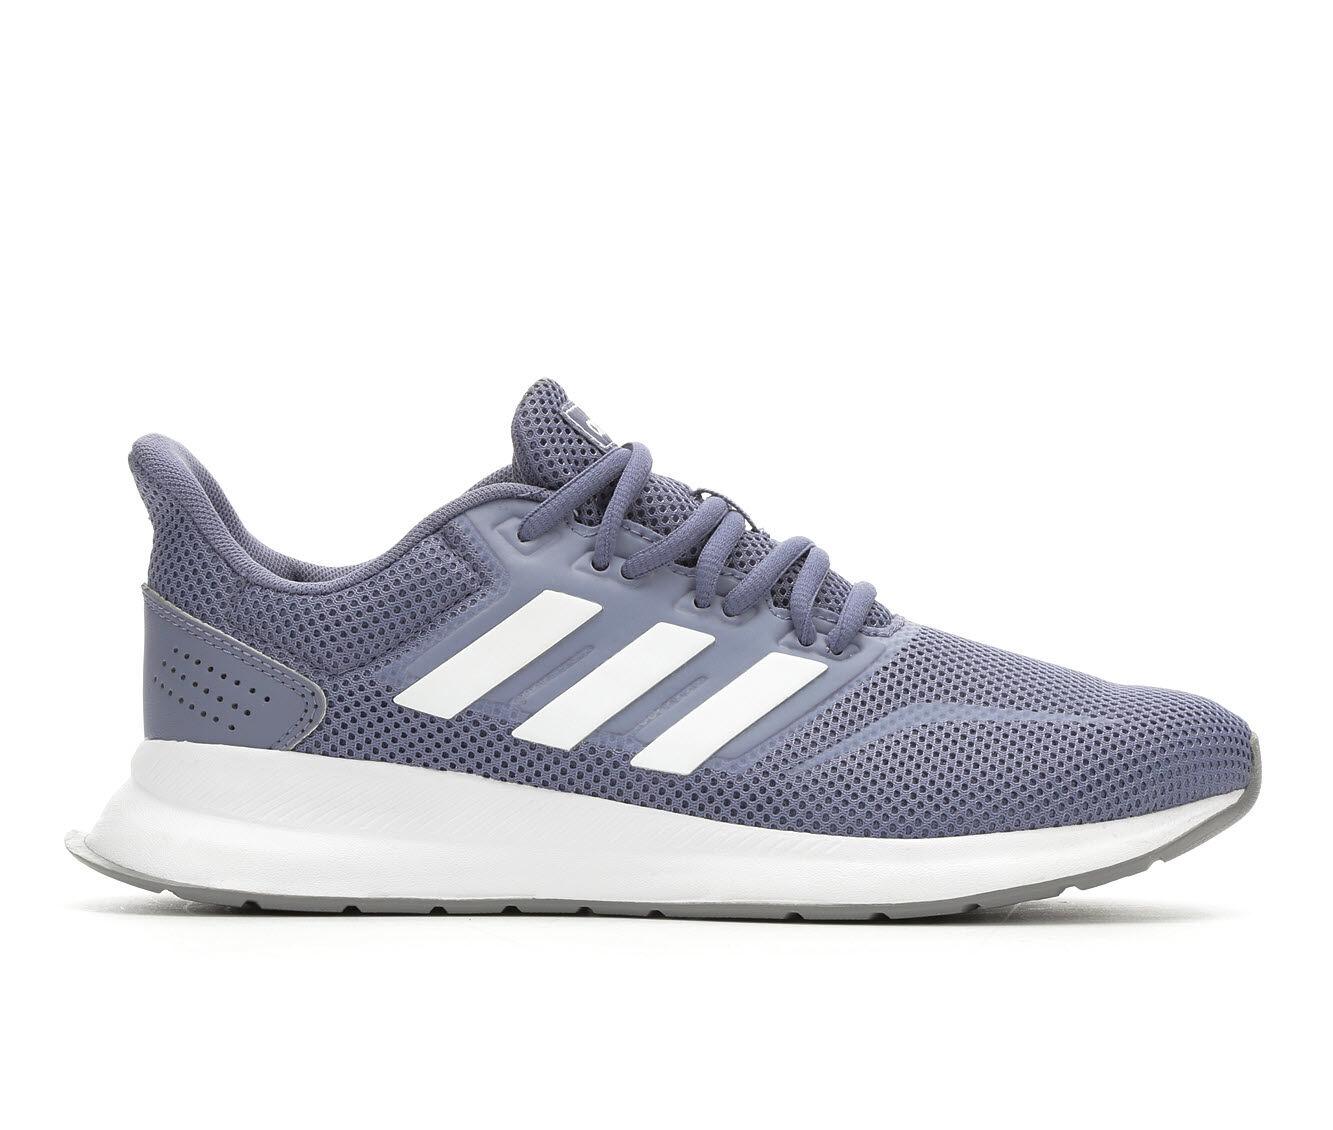 Women's Adidas RunFalcon Running Shoes Indigo/Wht/Gry